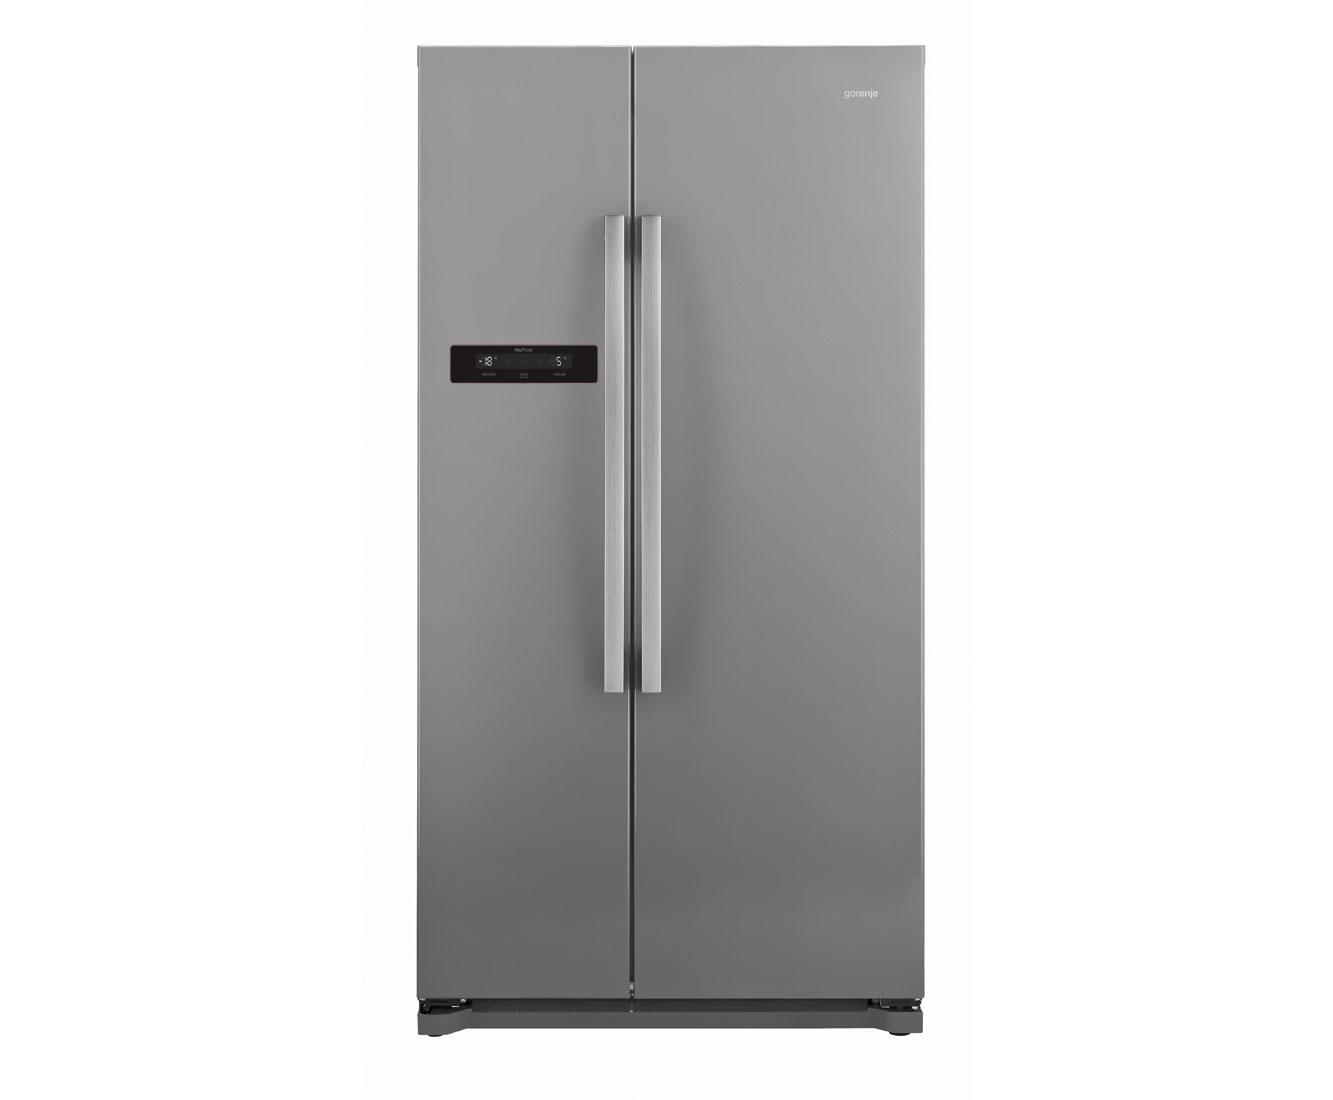 Gorenje Kühlschrank Side By Side : Gorenje kühlschrank filter wechseln kühl gefrier kombination rk